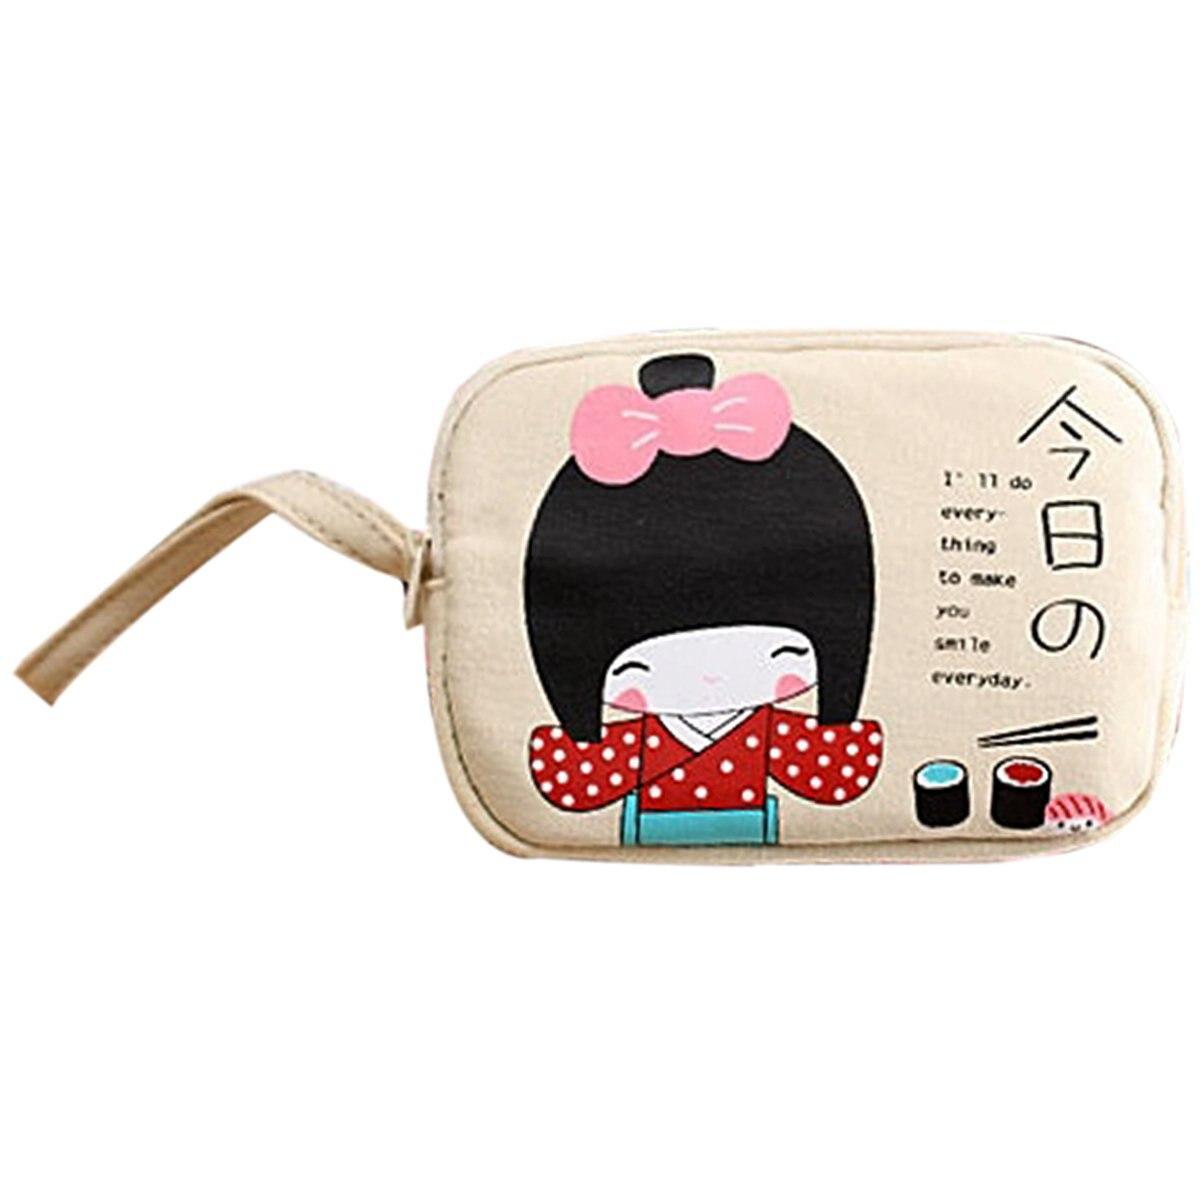 NEWBRAND New Cute Japanese Girl Print Canvas Phone Bag Double Zipper Purse Coin Bag Off-White